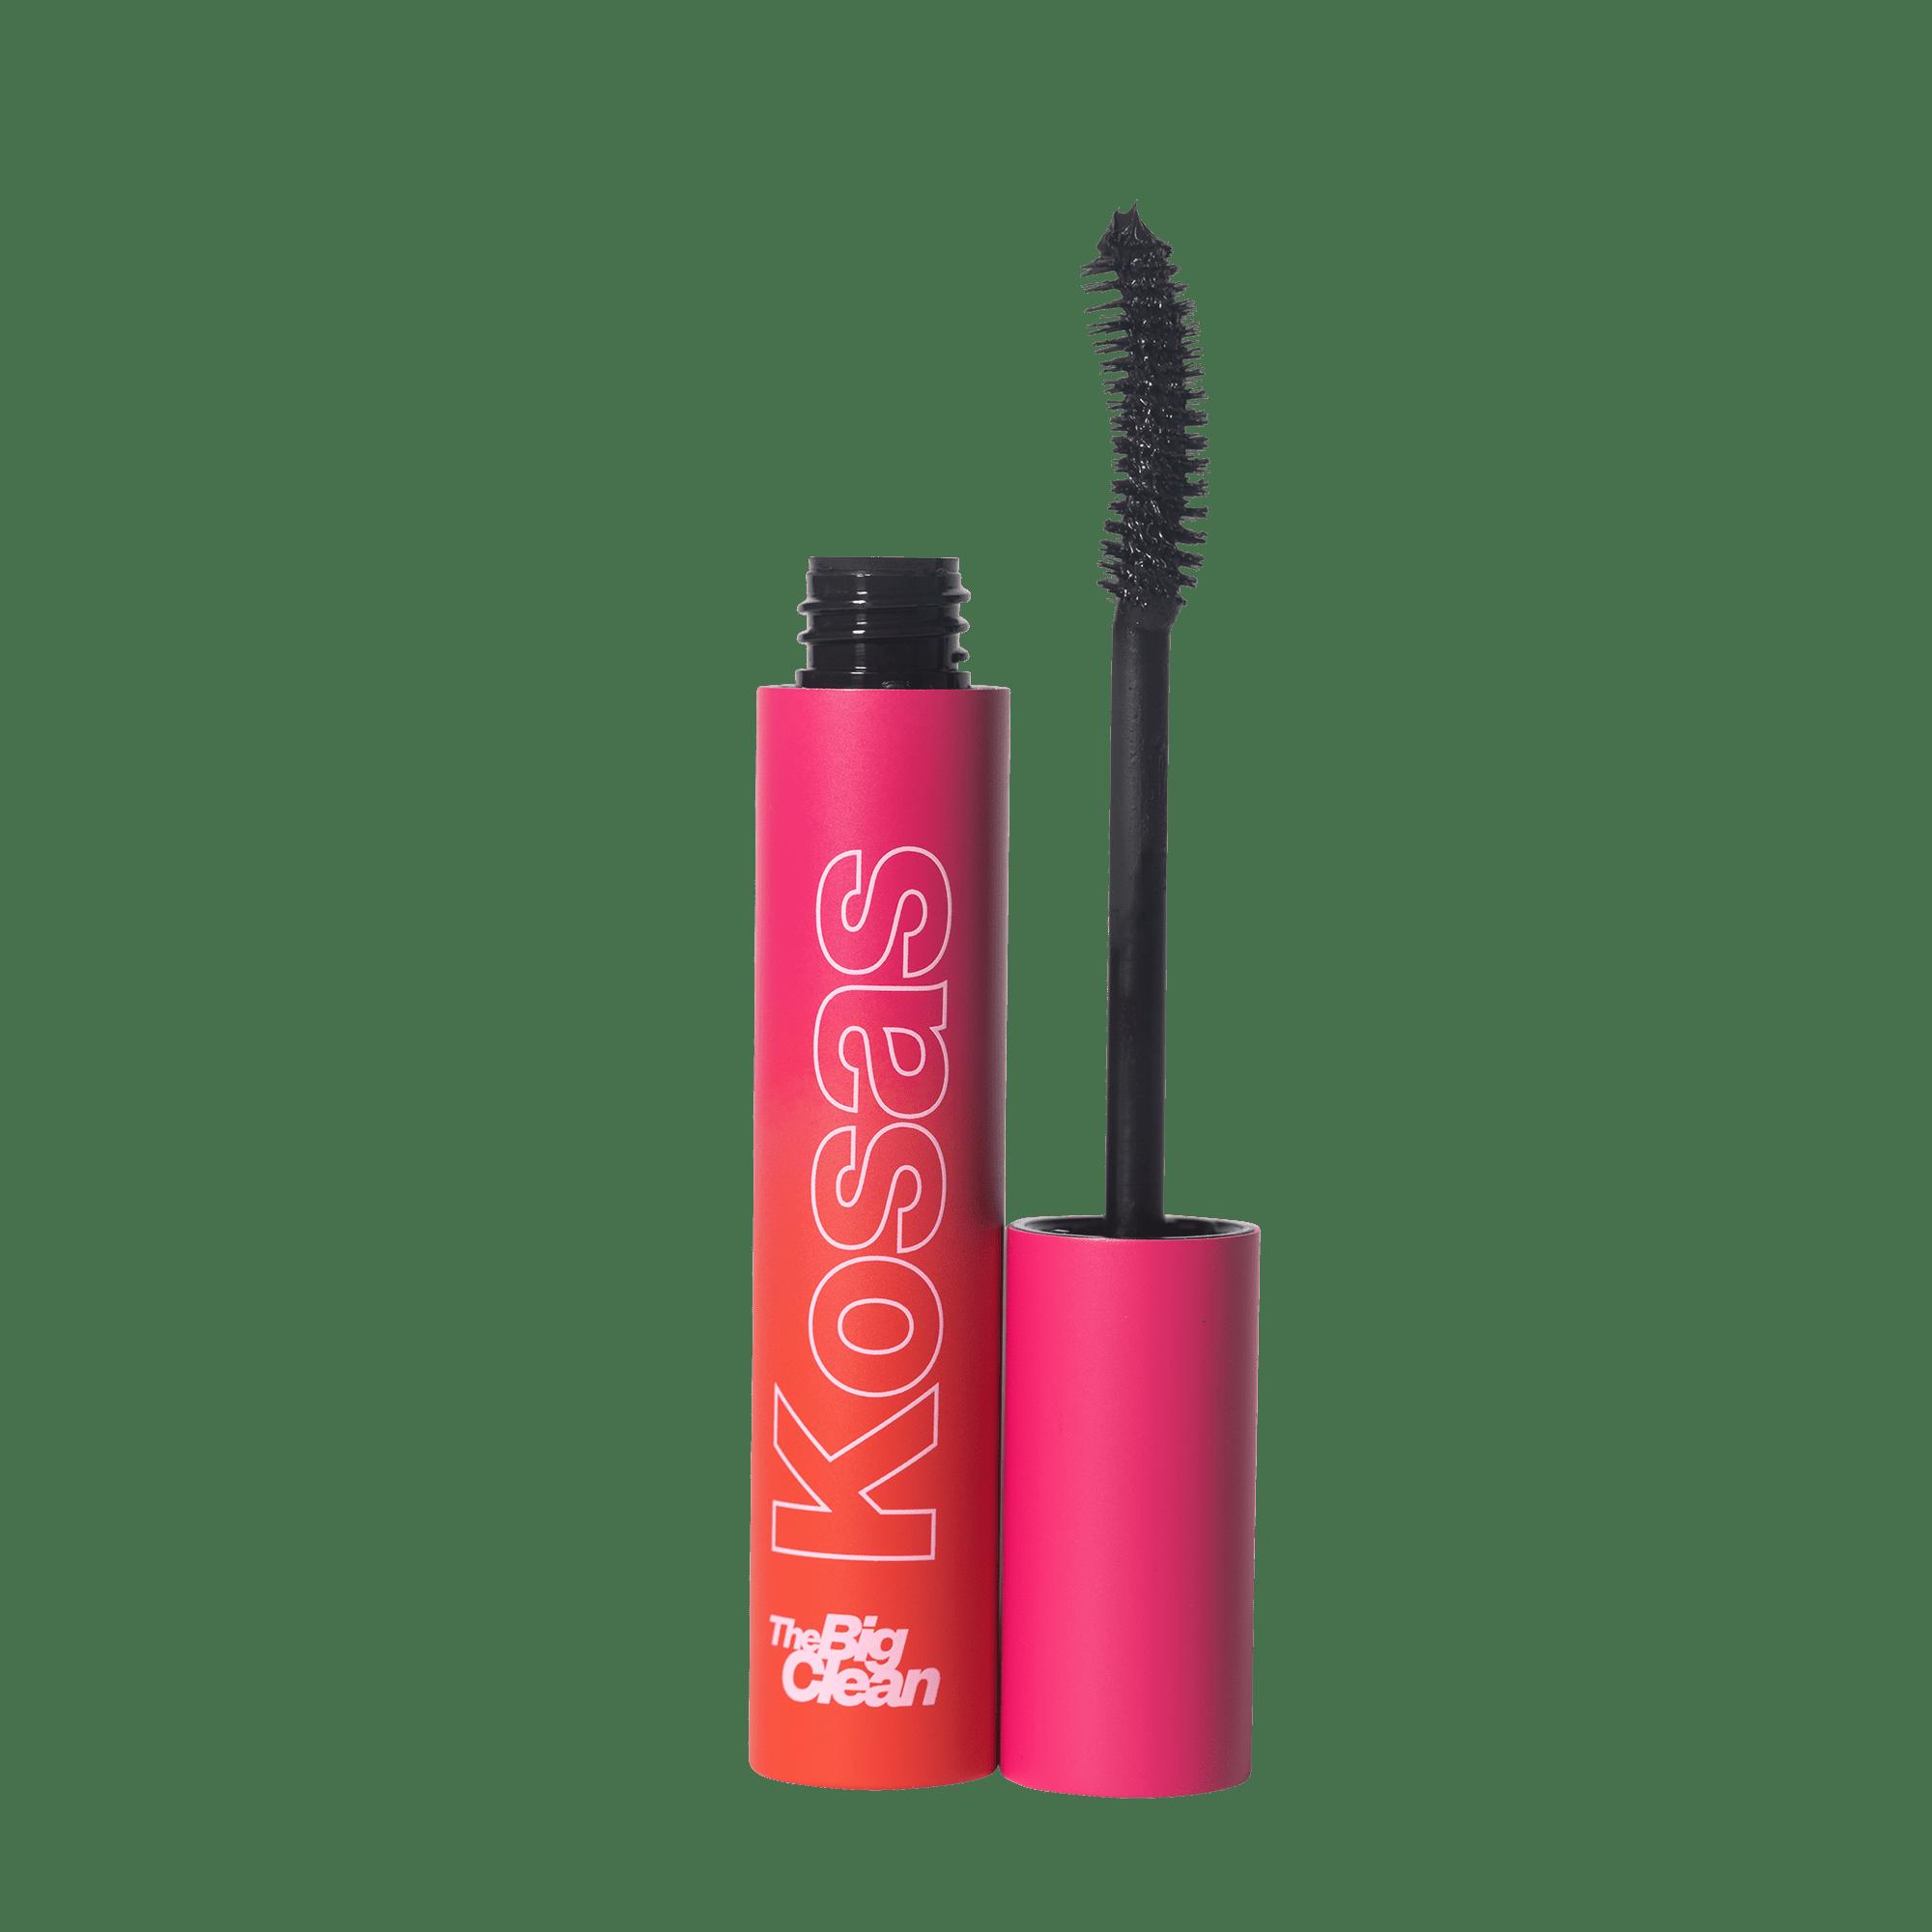 Kosas The Big Clean Mascara